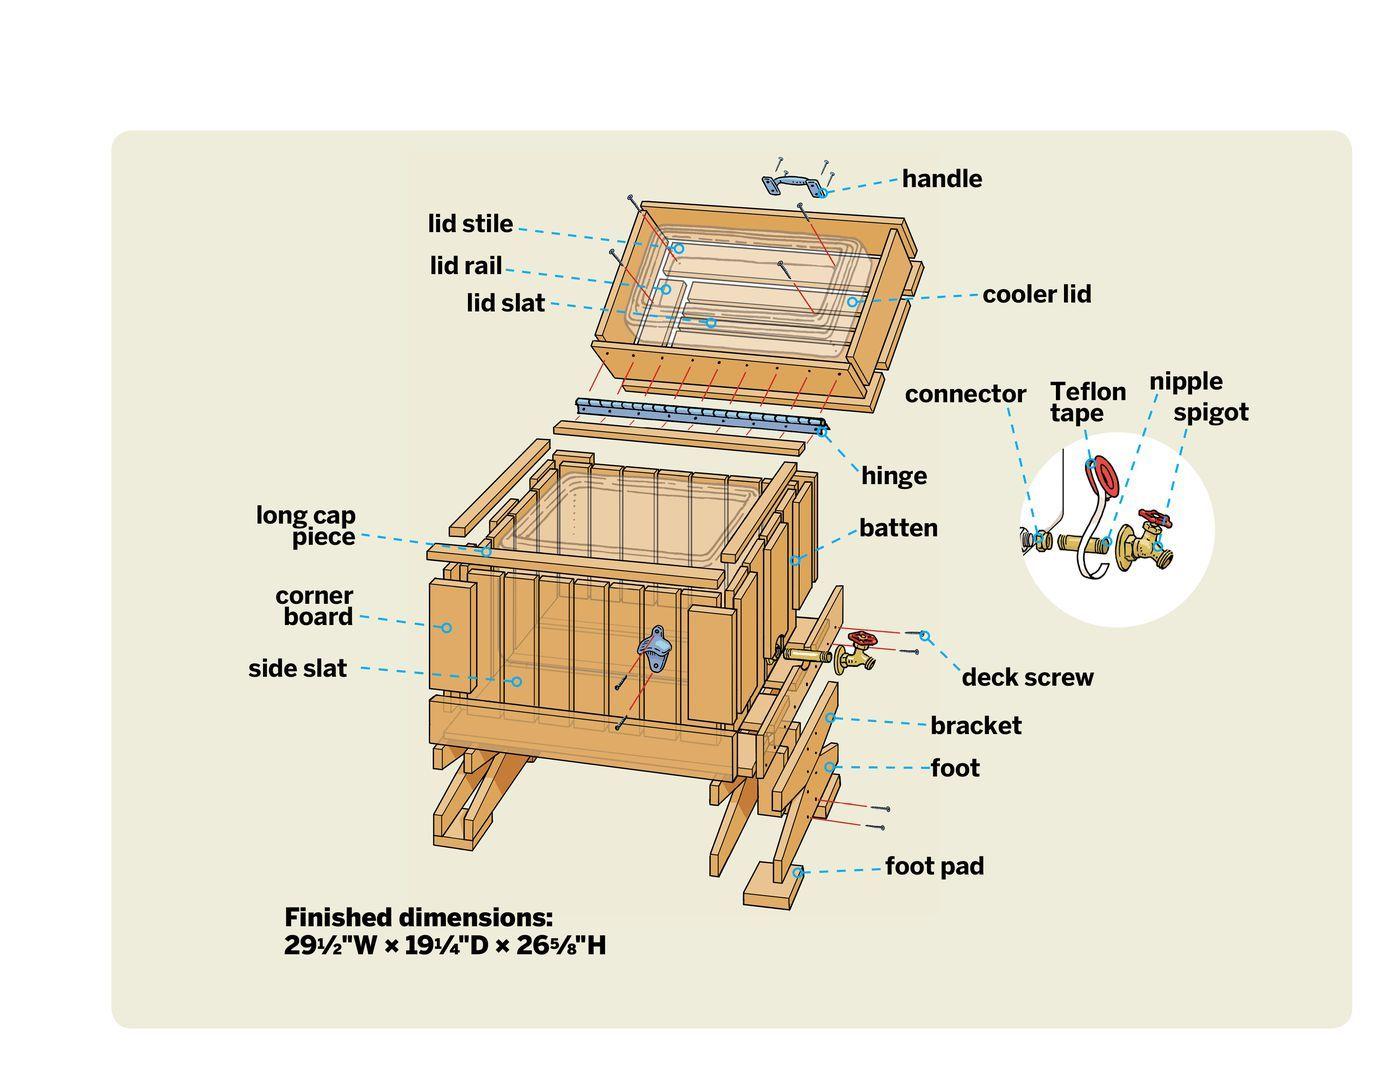 How To Build A Cedar Ice Chest Wooden Cooler Deck Cooler Wood Cooler